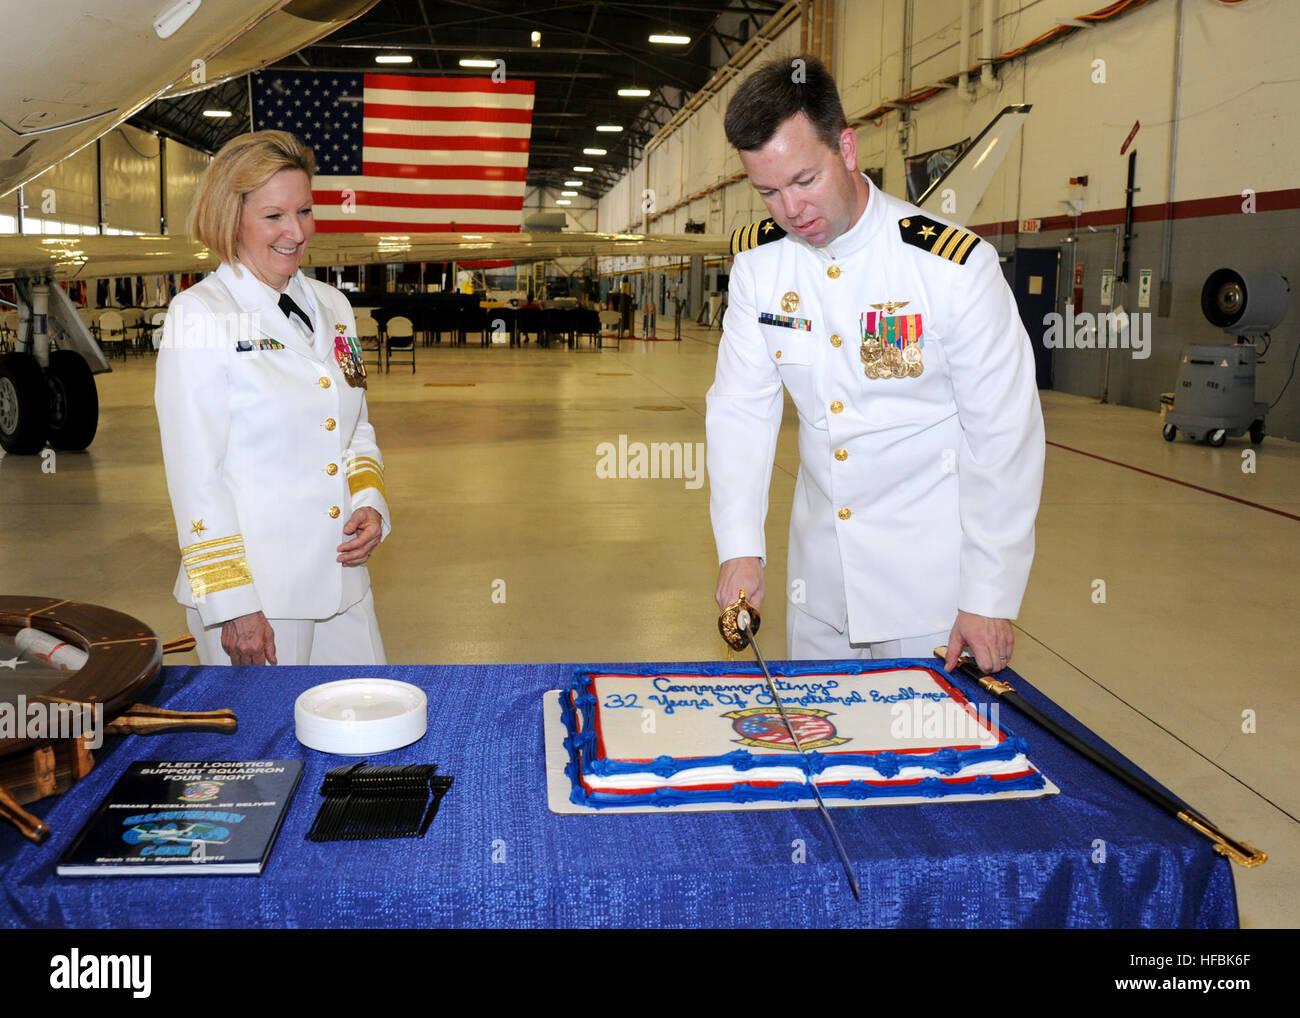 120907-N-FJ200-134  WASHINGTON (Sept. 7, 2012) Vice Adm. Robin Braun, Chief of Navy Reserve, watches Cmdr. George - Stock Image